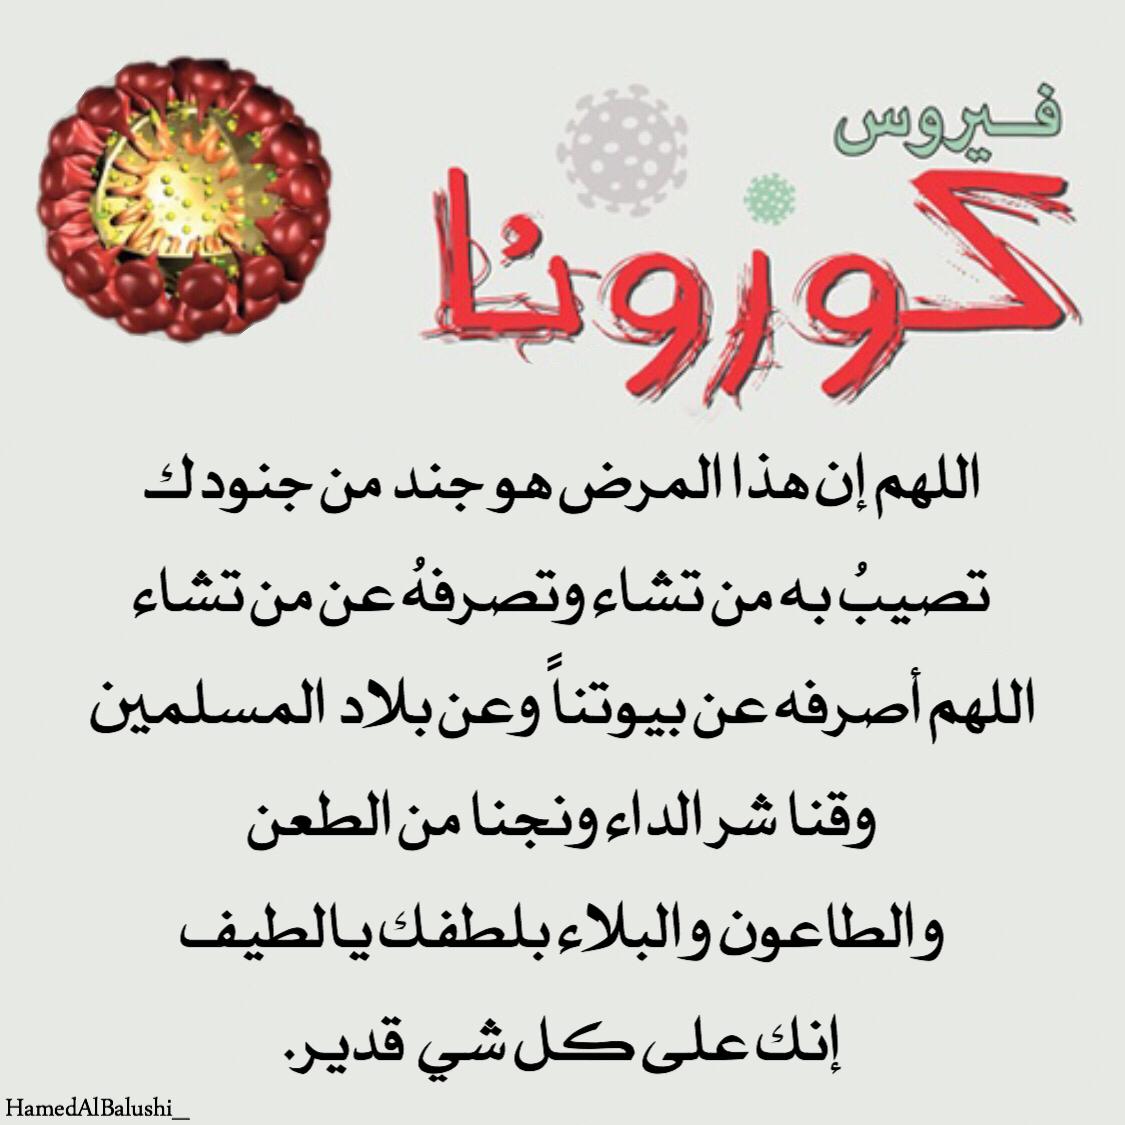 فيروس كورونا Arabic Calligraphy Calligraphy